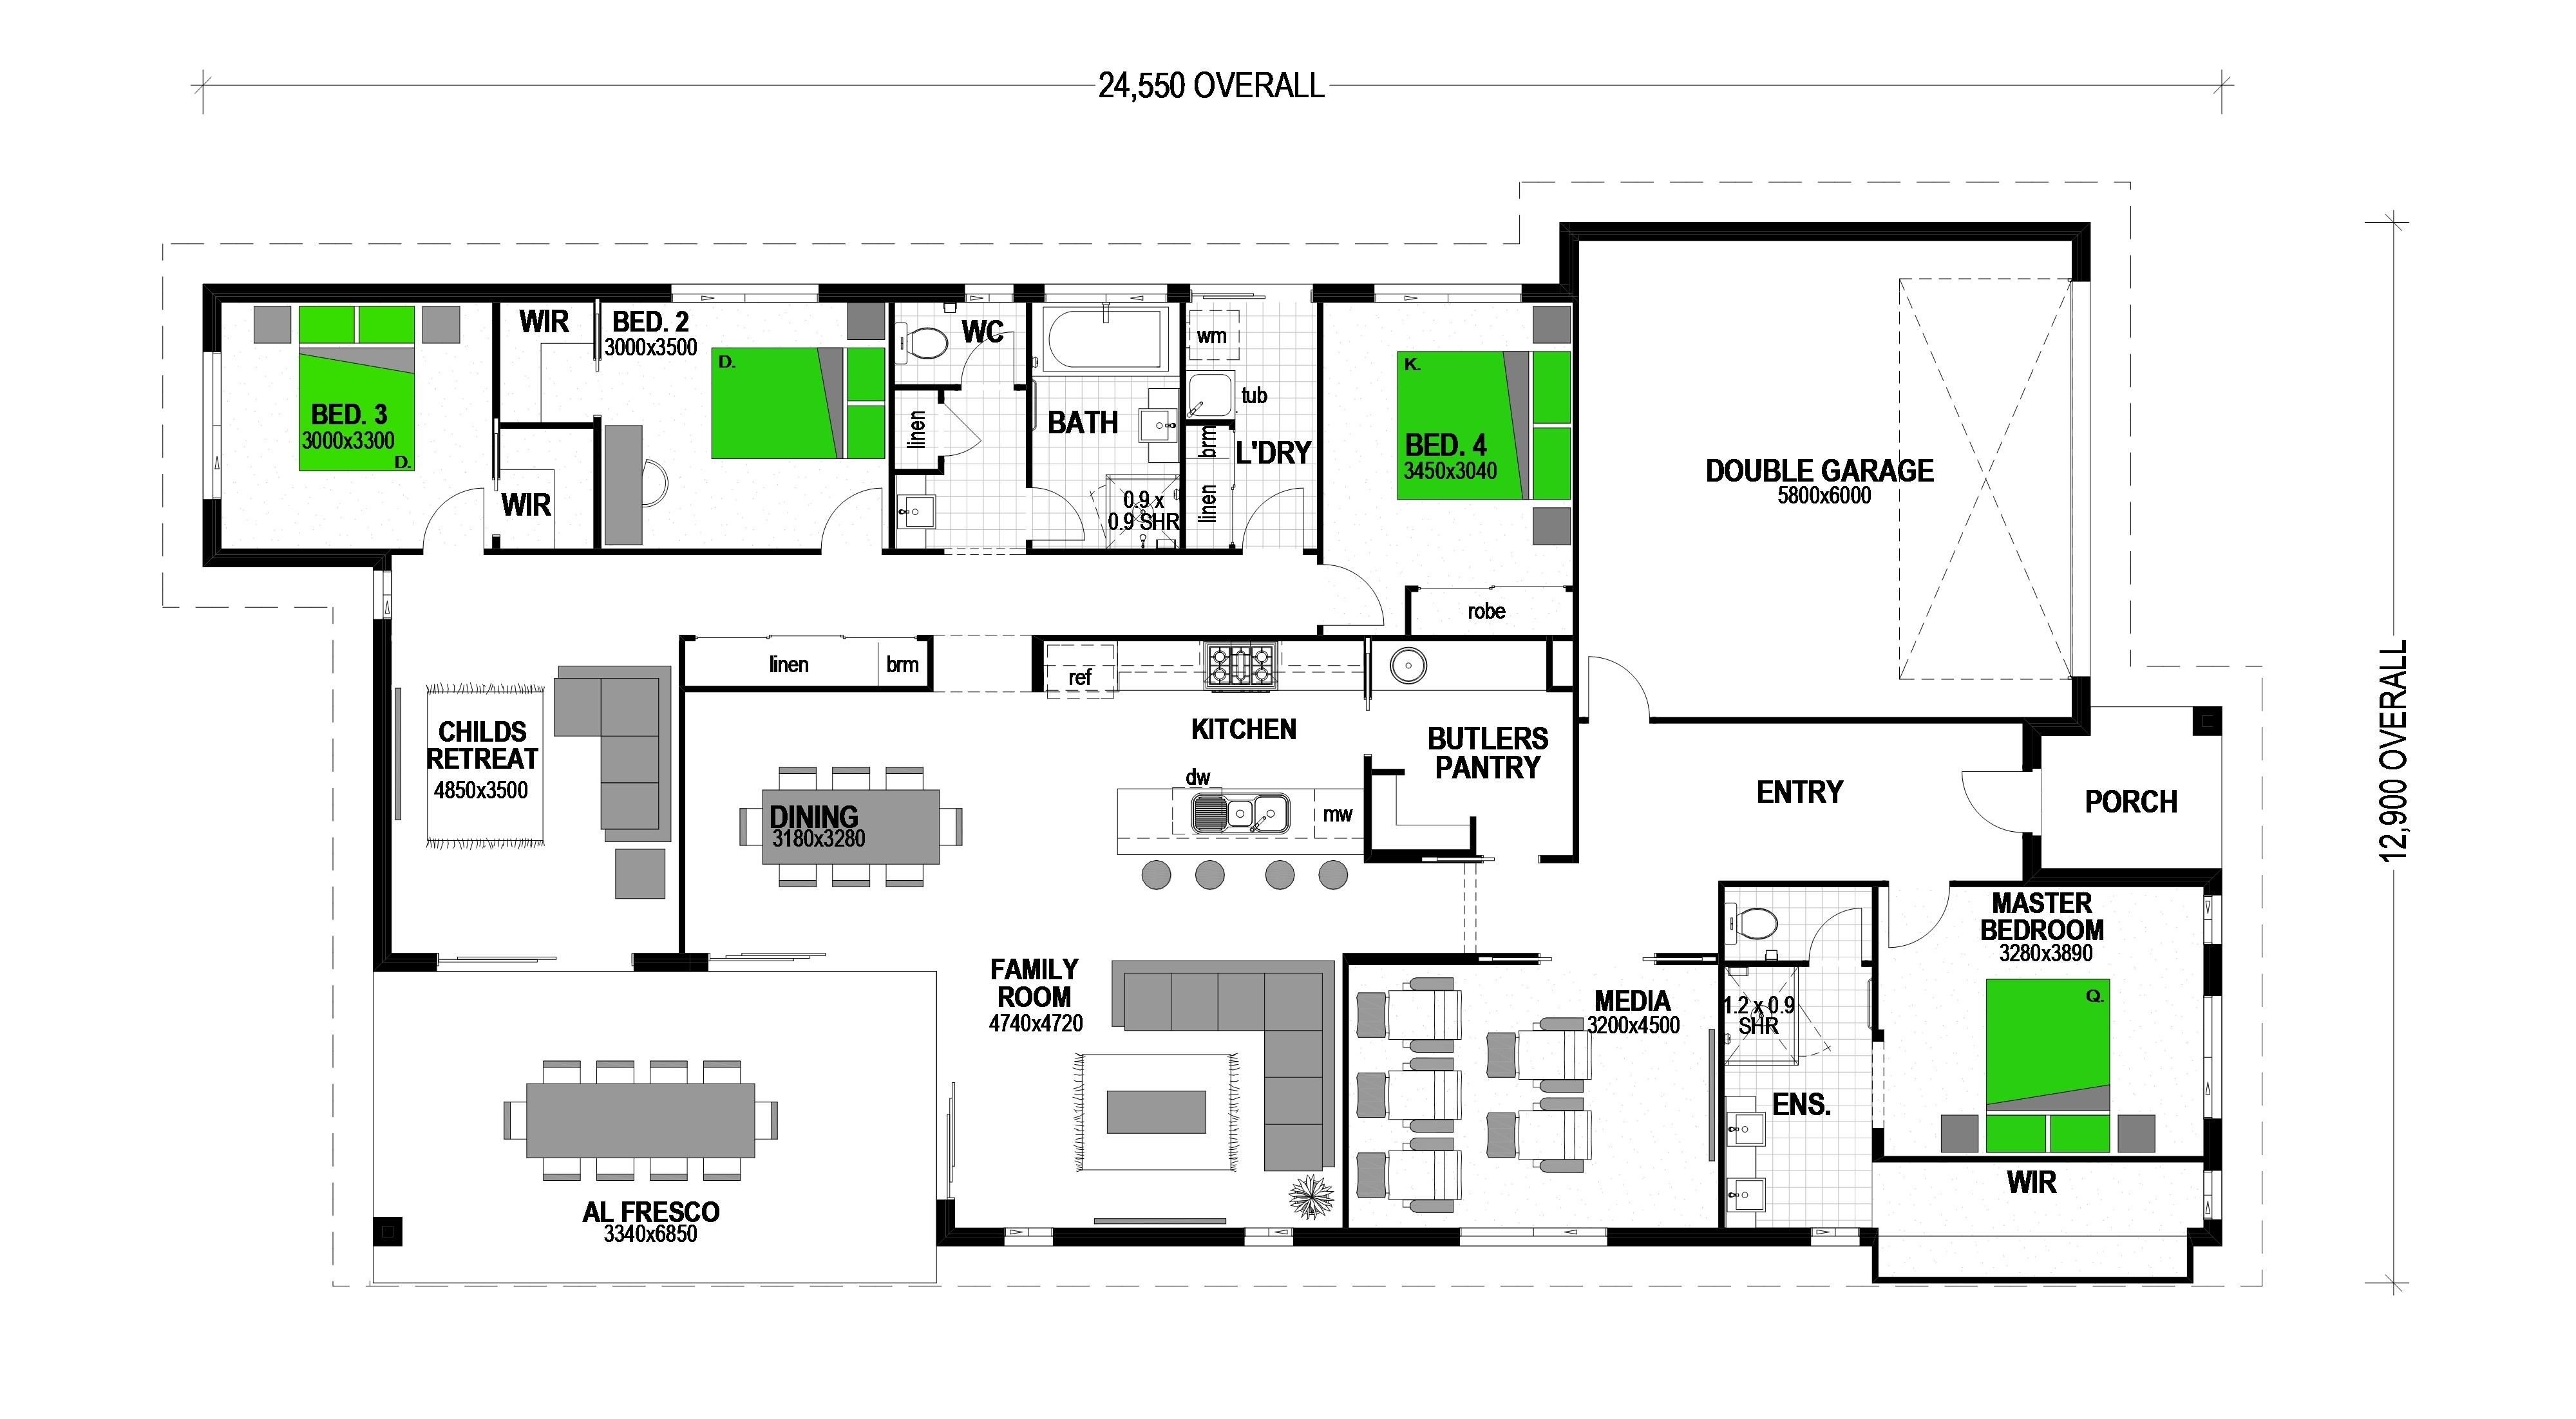 LOT 12 SUNDOWNERS COURT UPPER CABOOLTURE Floorplan